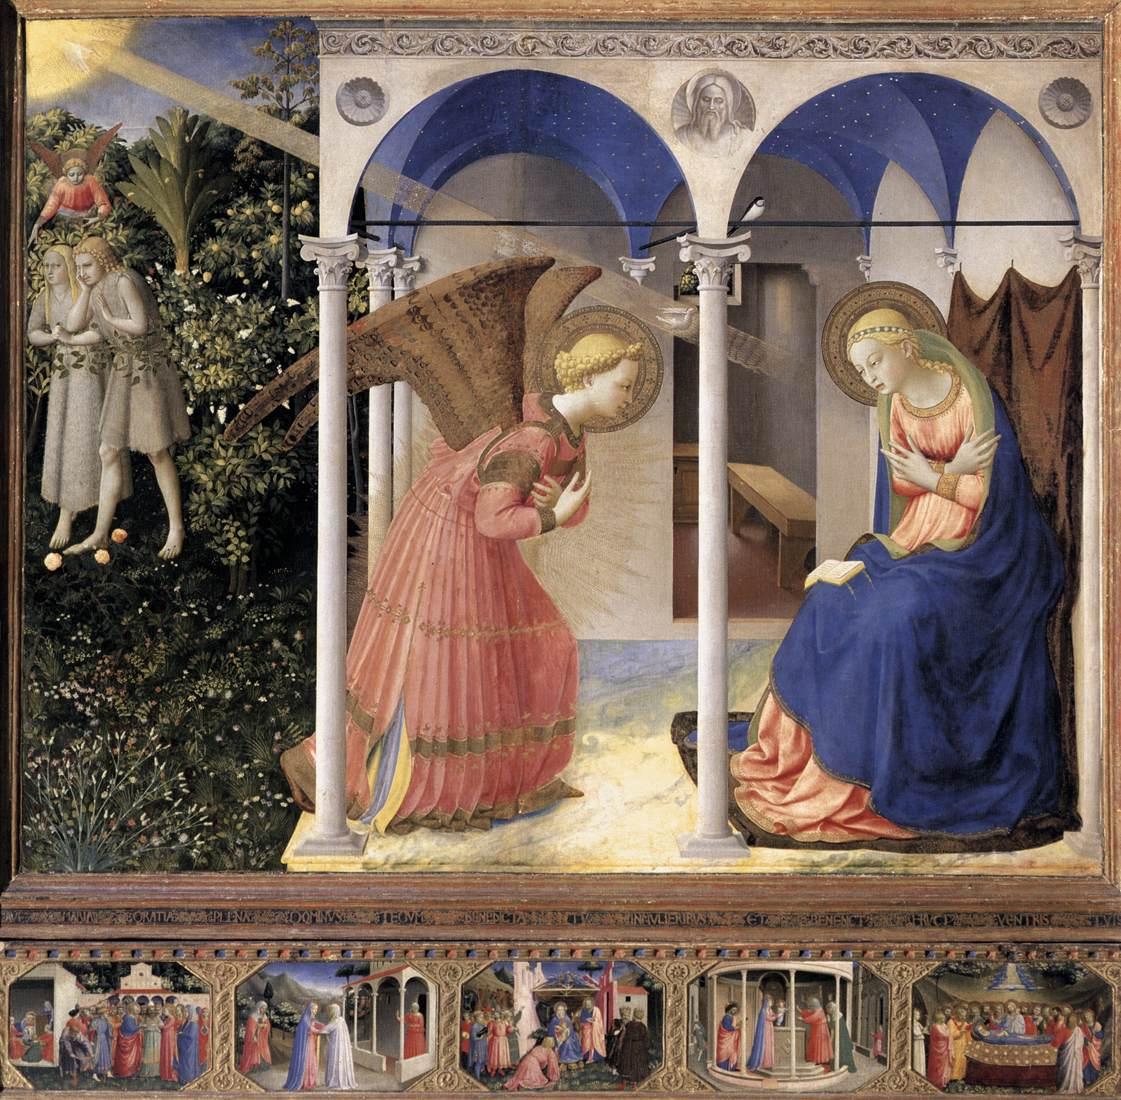 Fra Angelico , Annunciation  from the Prado Altarpiece (1430-32)